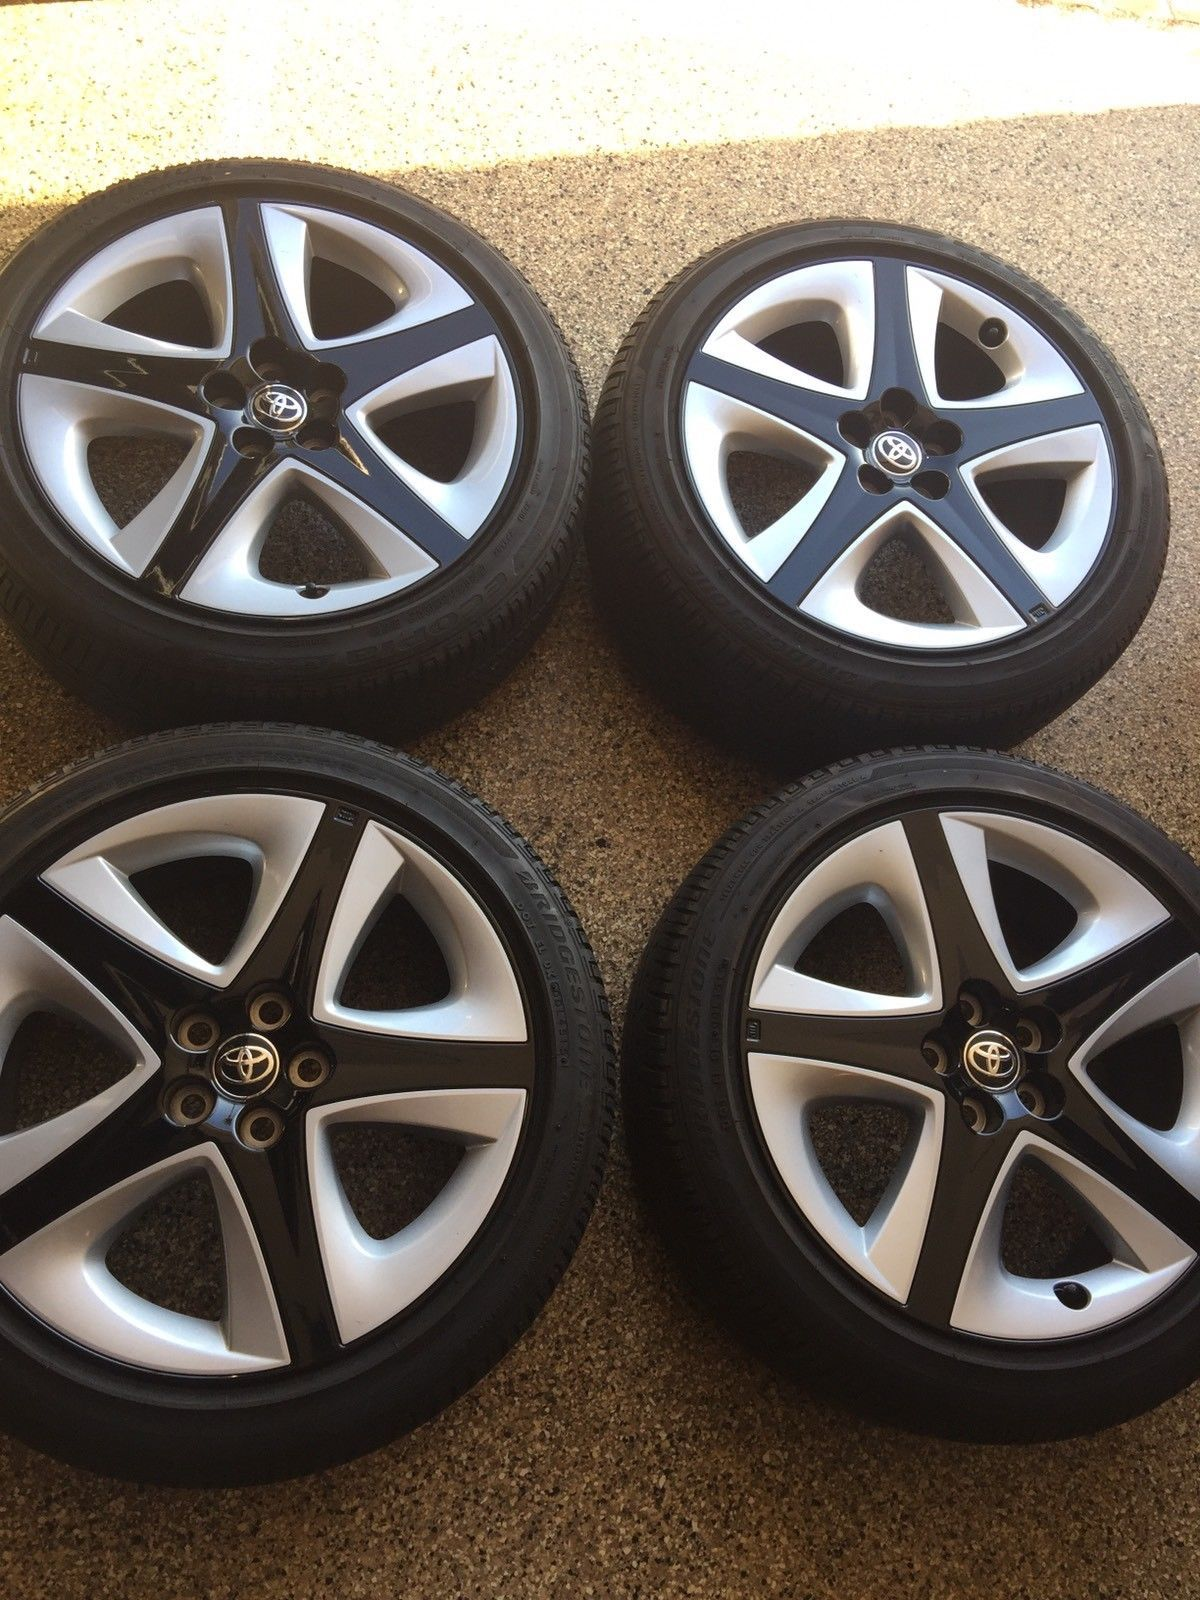 toyota aluminum alloy tacoma wheel rim wheels htm